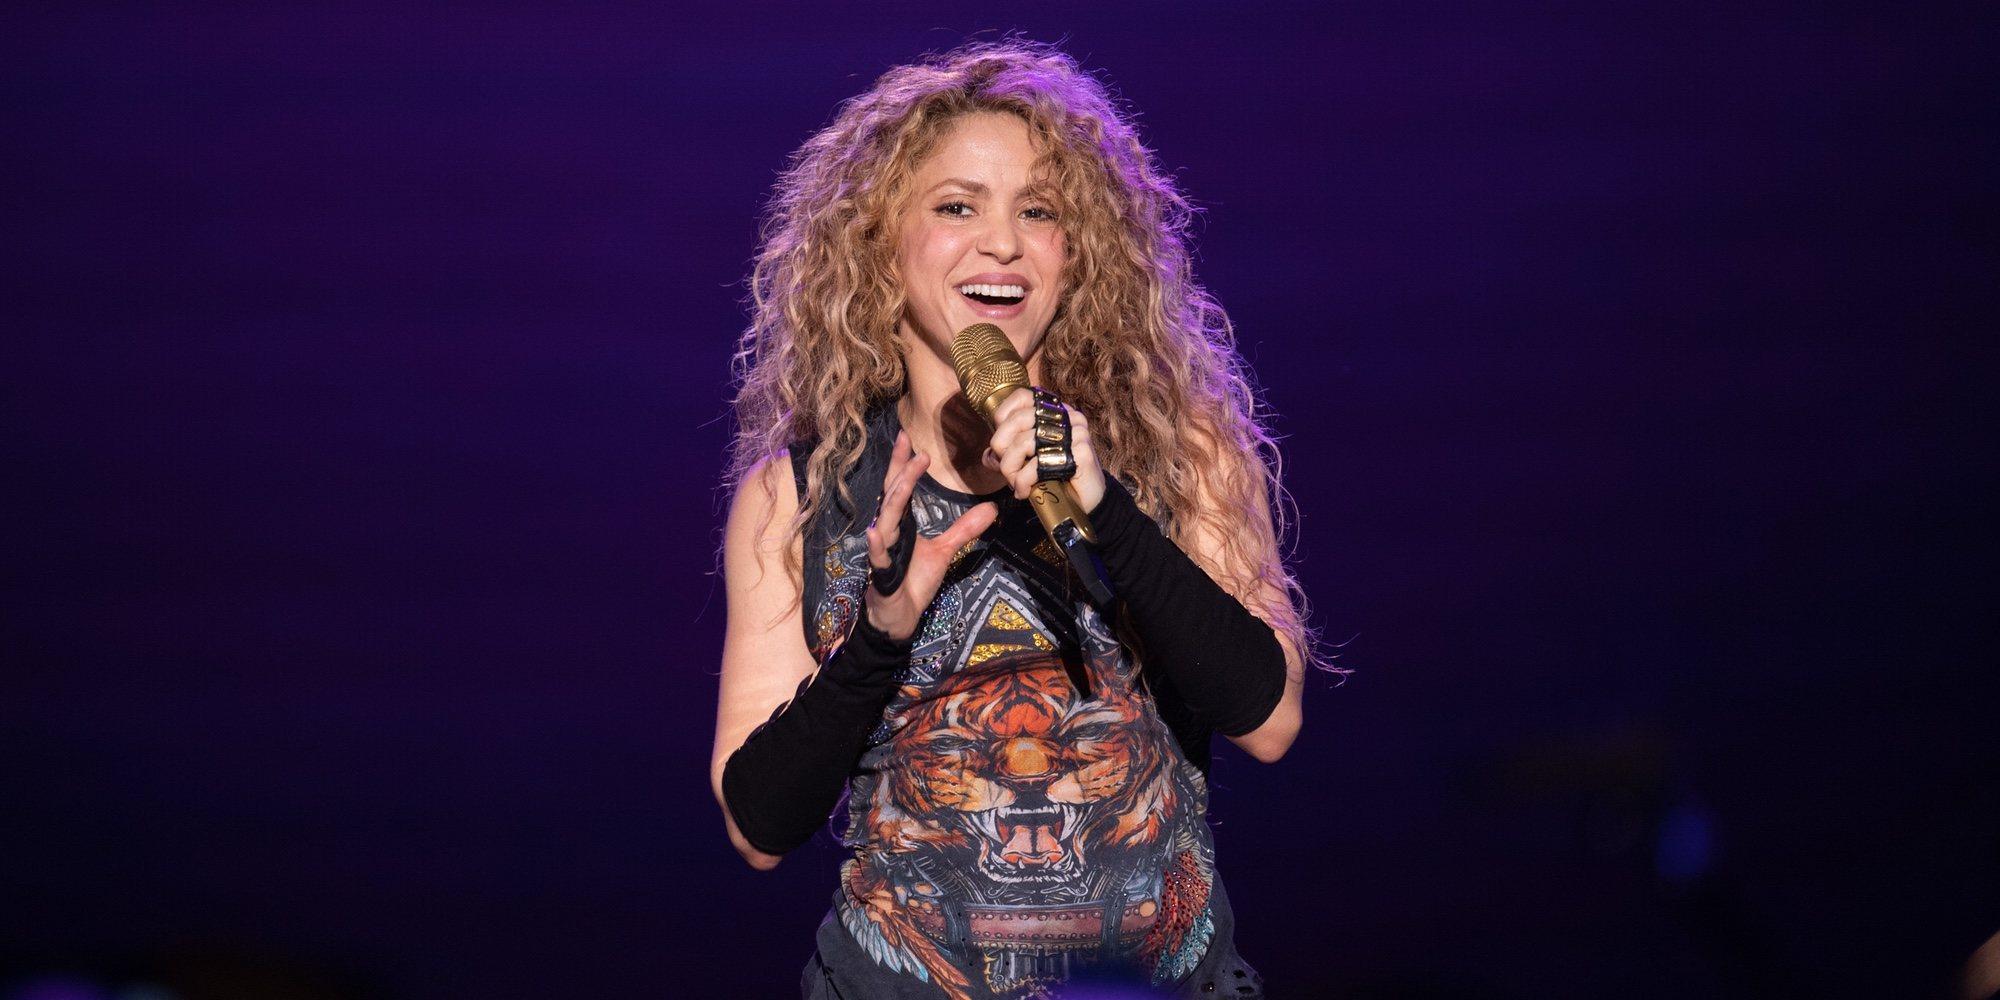 Shakira retira el símbolo 'nazi' de su gira 'El Dorado' tras la polémica generada